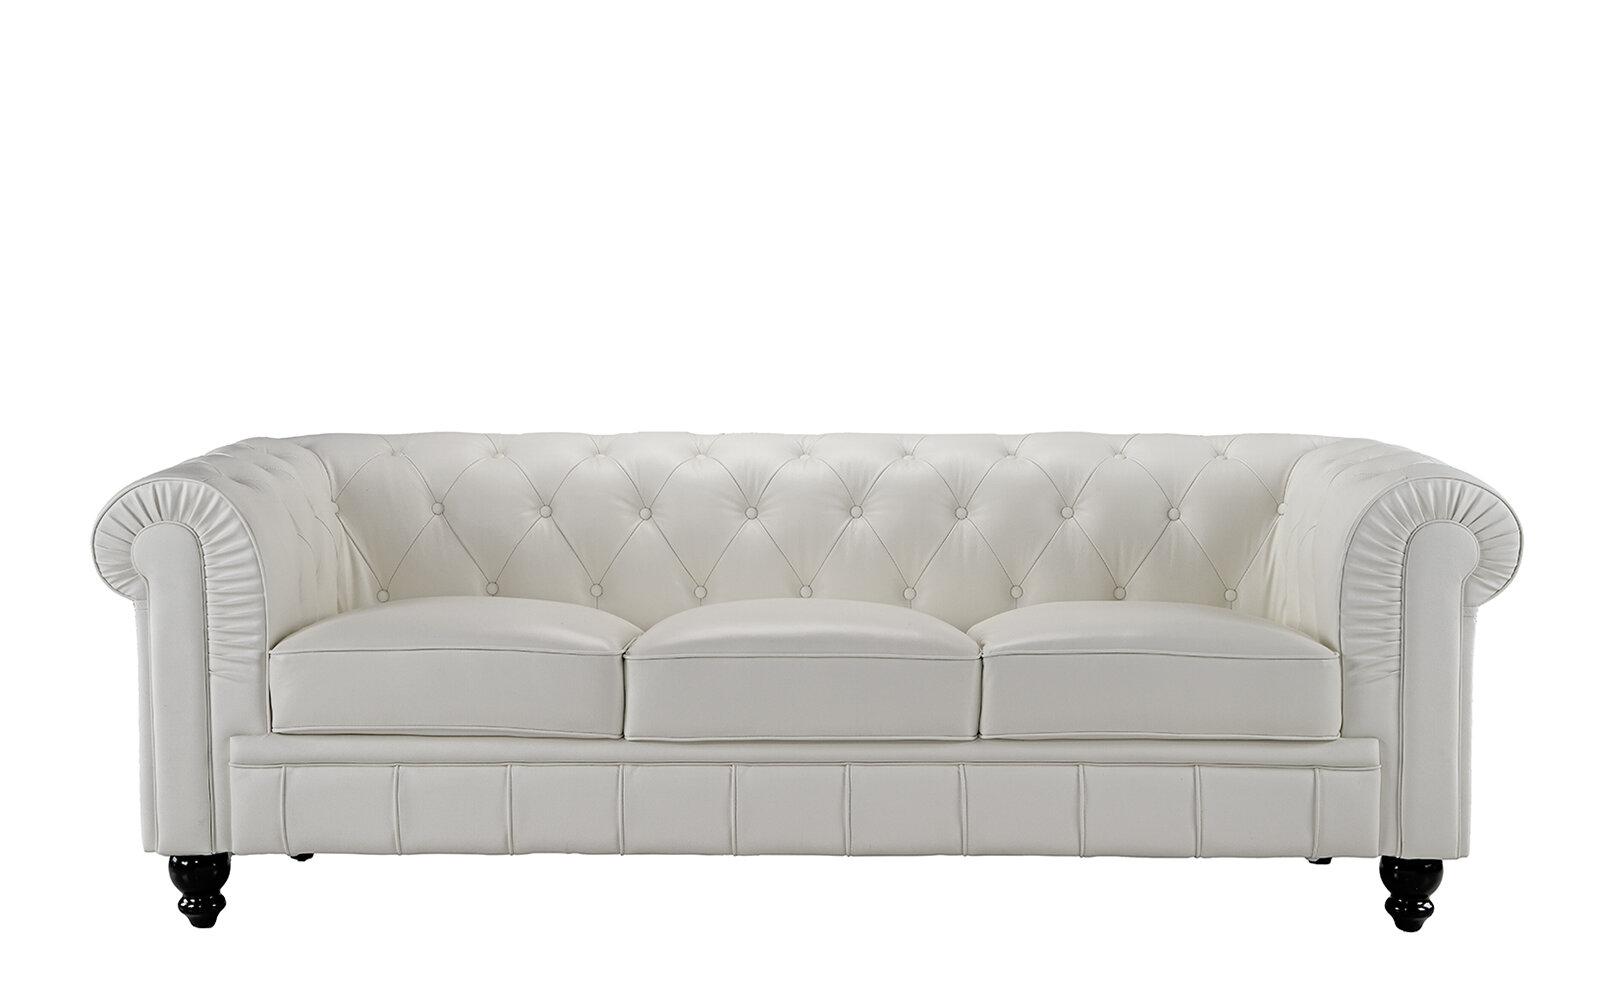 Alpharetta Traditional Chesterfield Leather Sofa